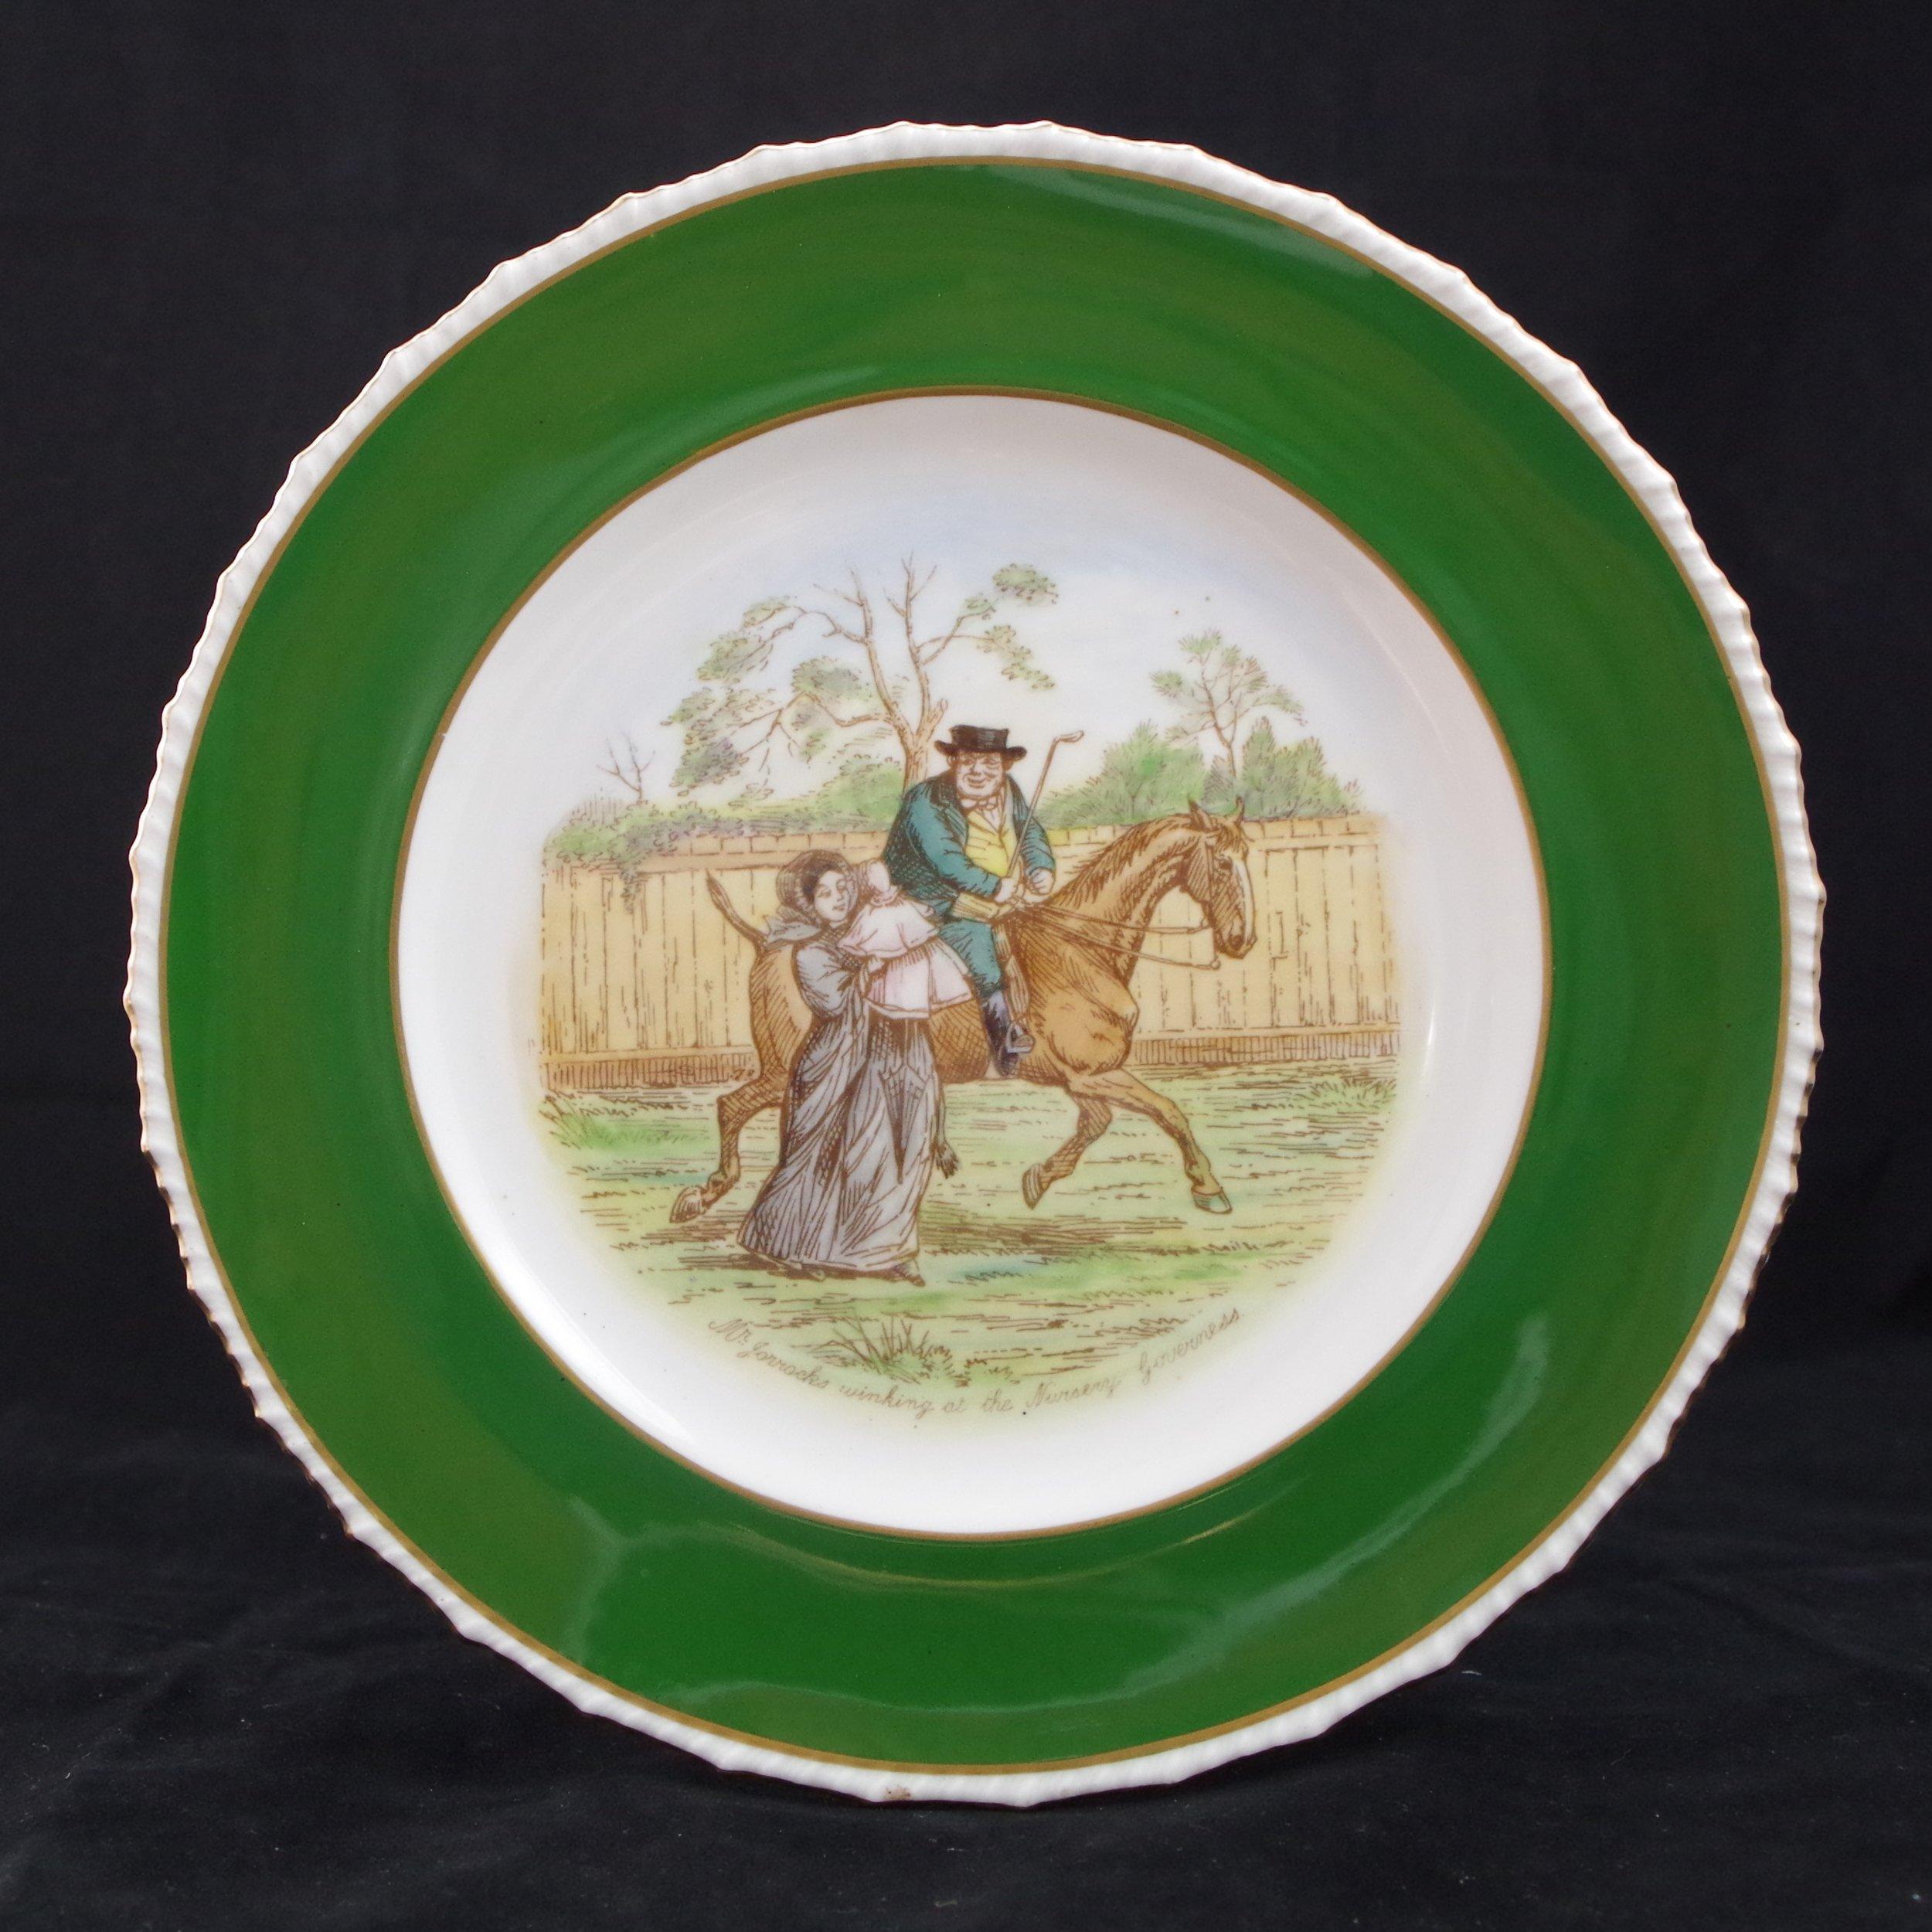 royal-crown-derby-stanhope-siam-green-ground-jorrocks-4